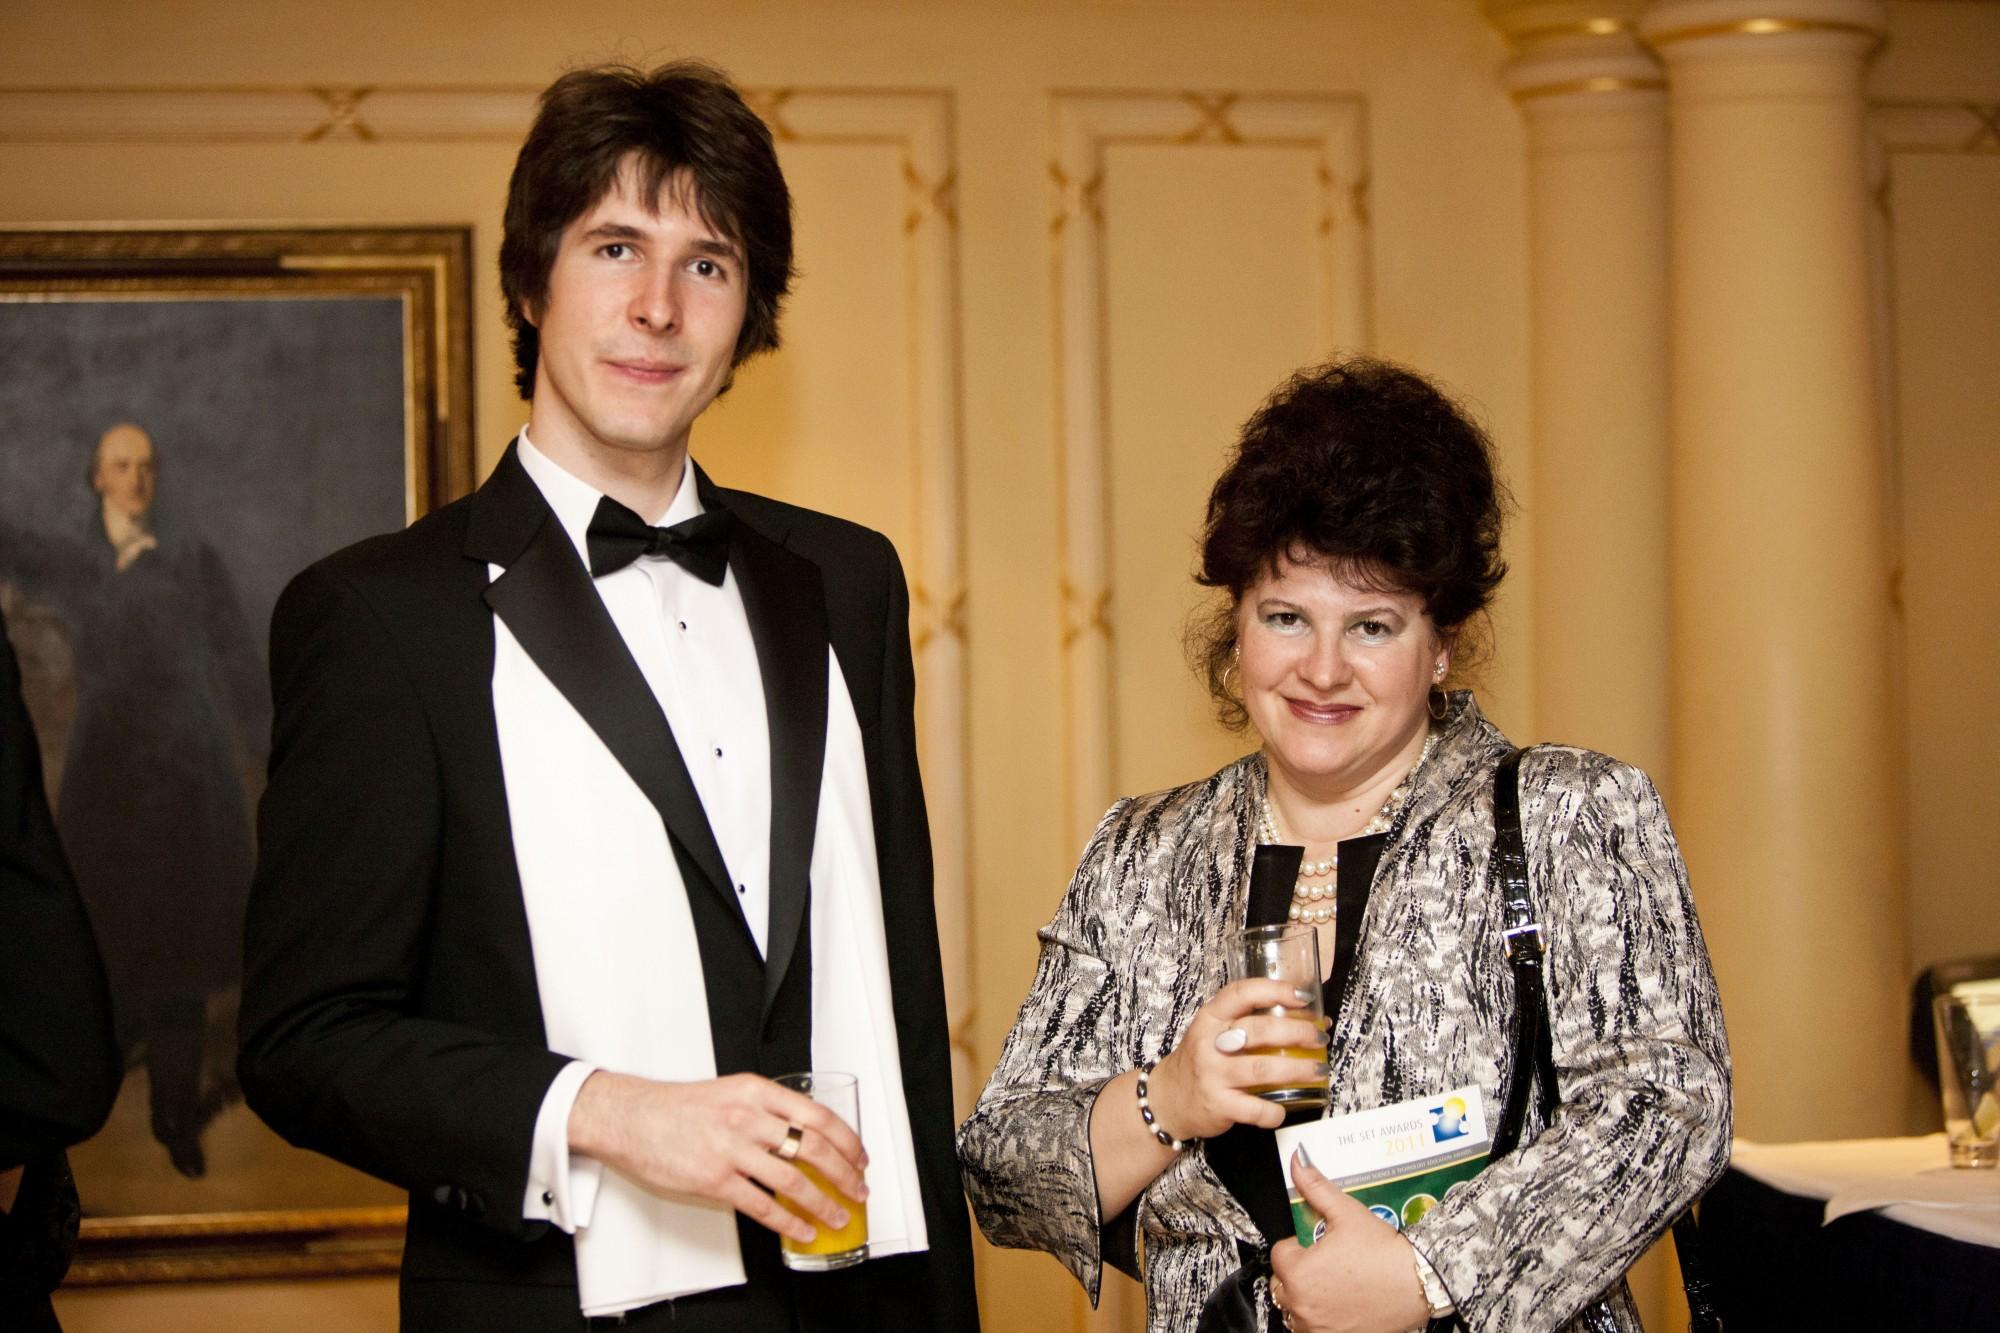 Flaviu Cipcigan and his mother, Dr Liana Cipcigan, at the SET Student of the Year Awards.